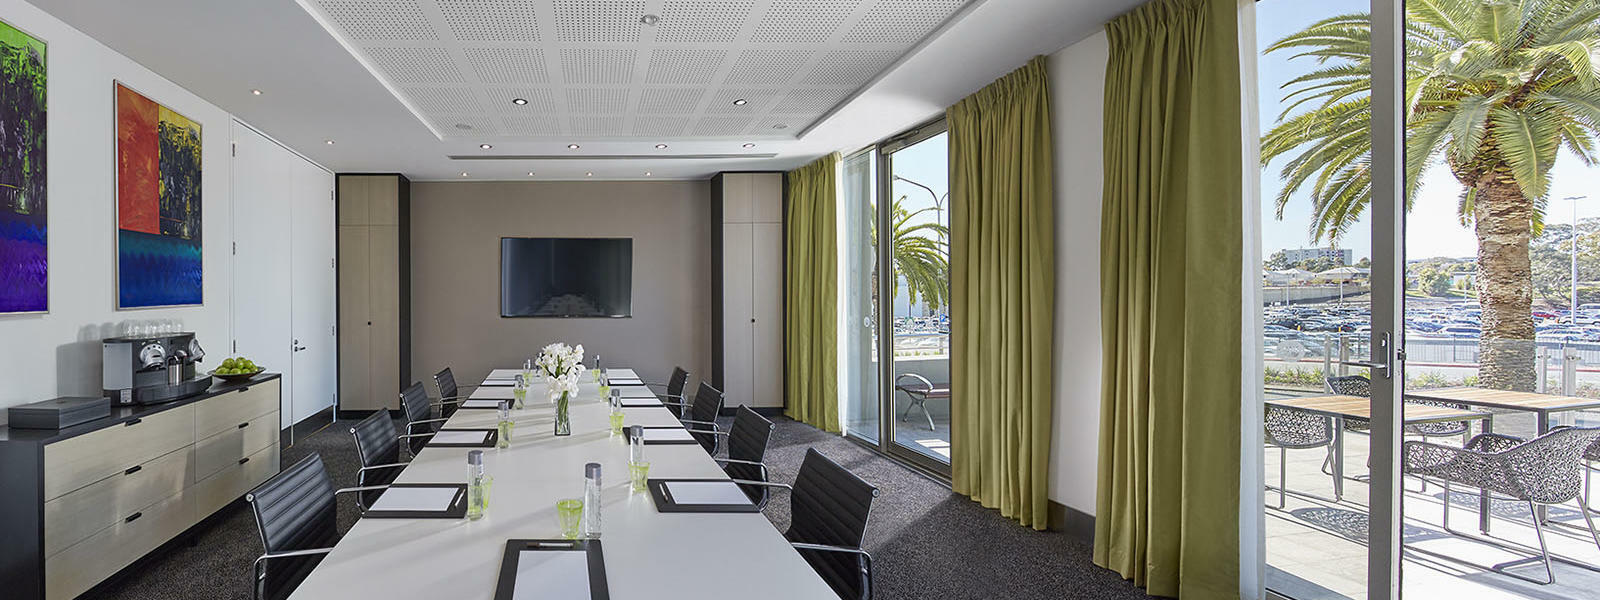 Crown Promenade Business Centre  Meeting facilities at Crown Hotel Perth